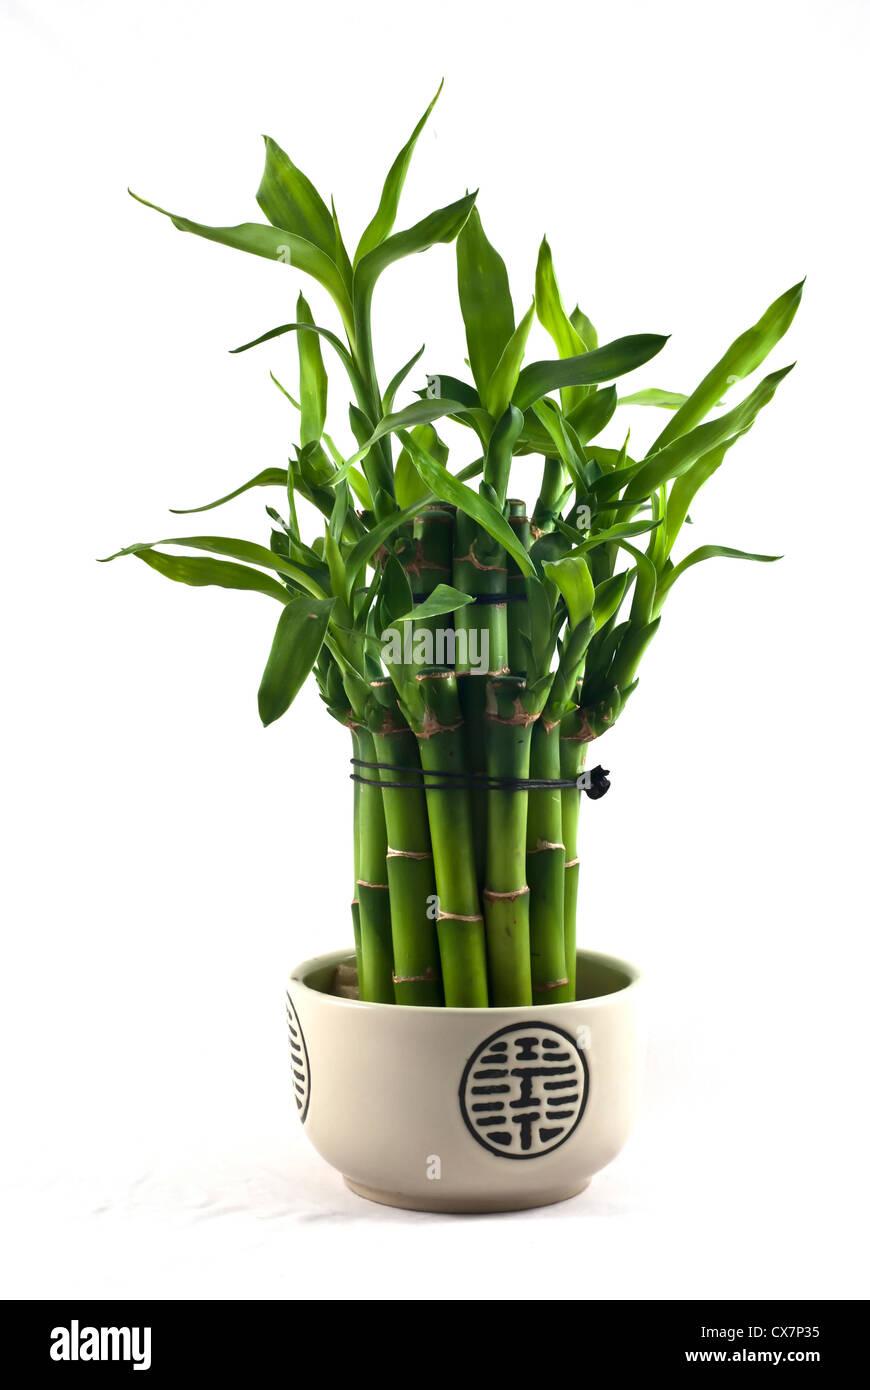 Bambu Stock Photos & Bambu Stock Images - Page 2 - Alamy